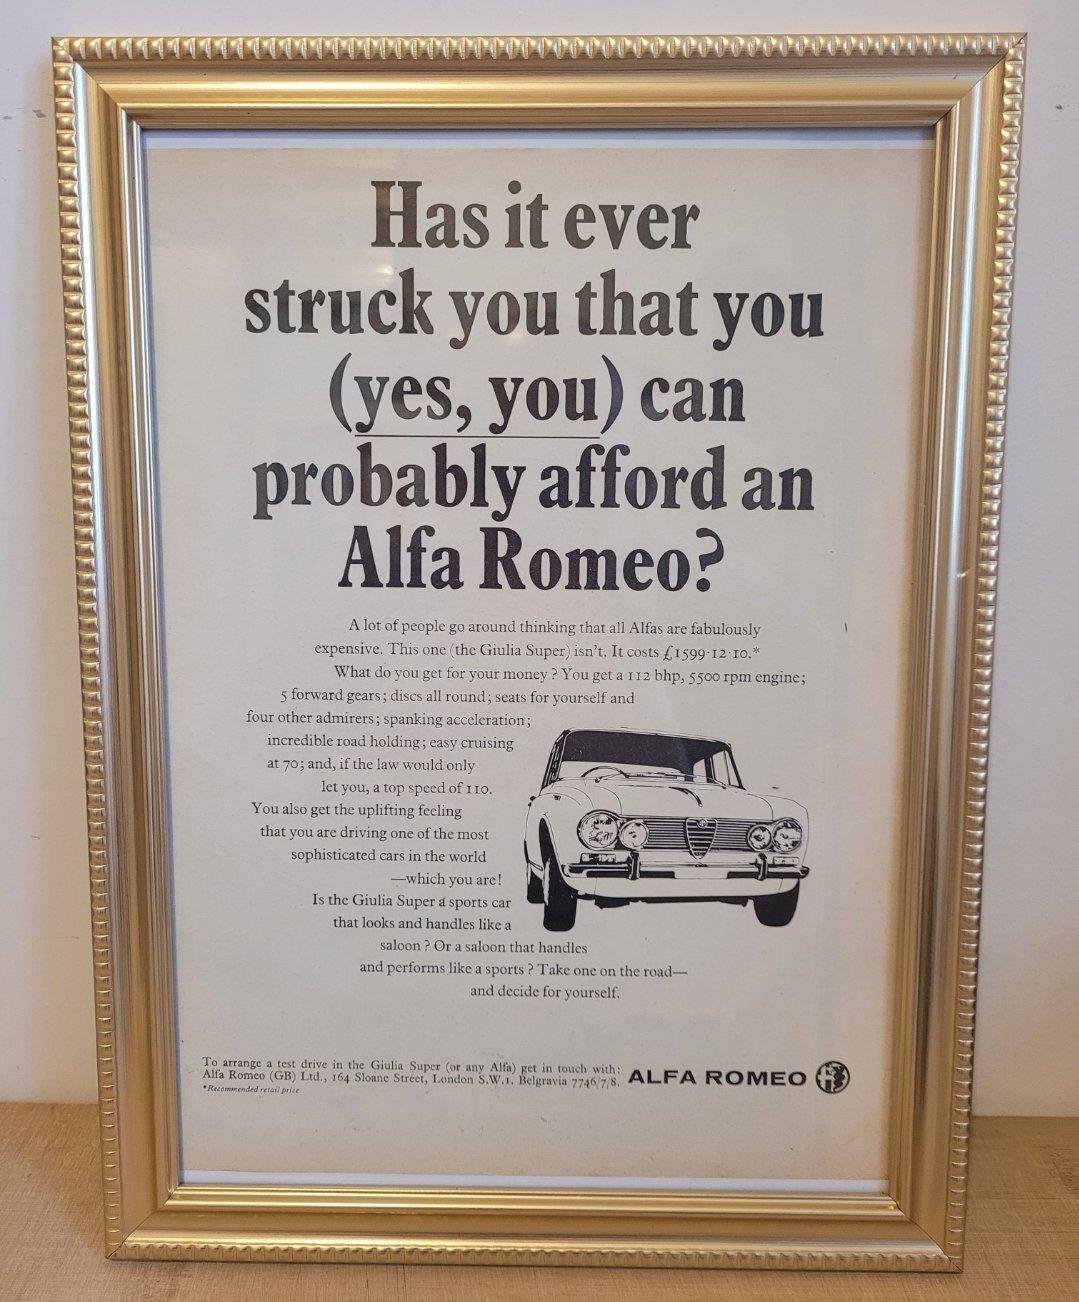 Original 1967 Alfa Giulia Super Framed Advert